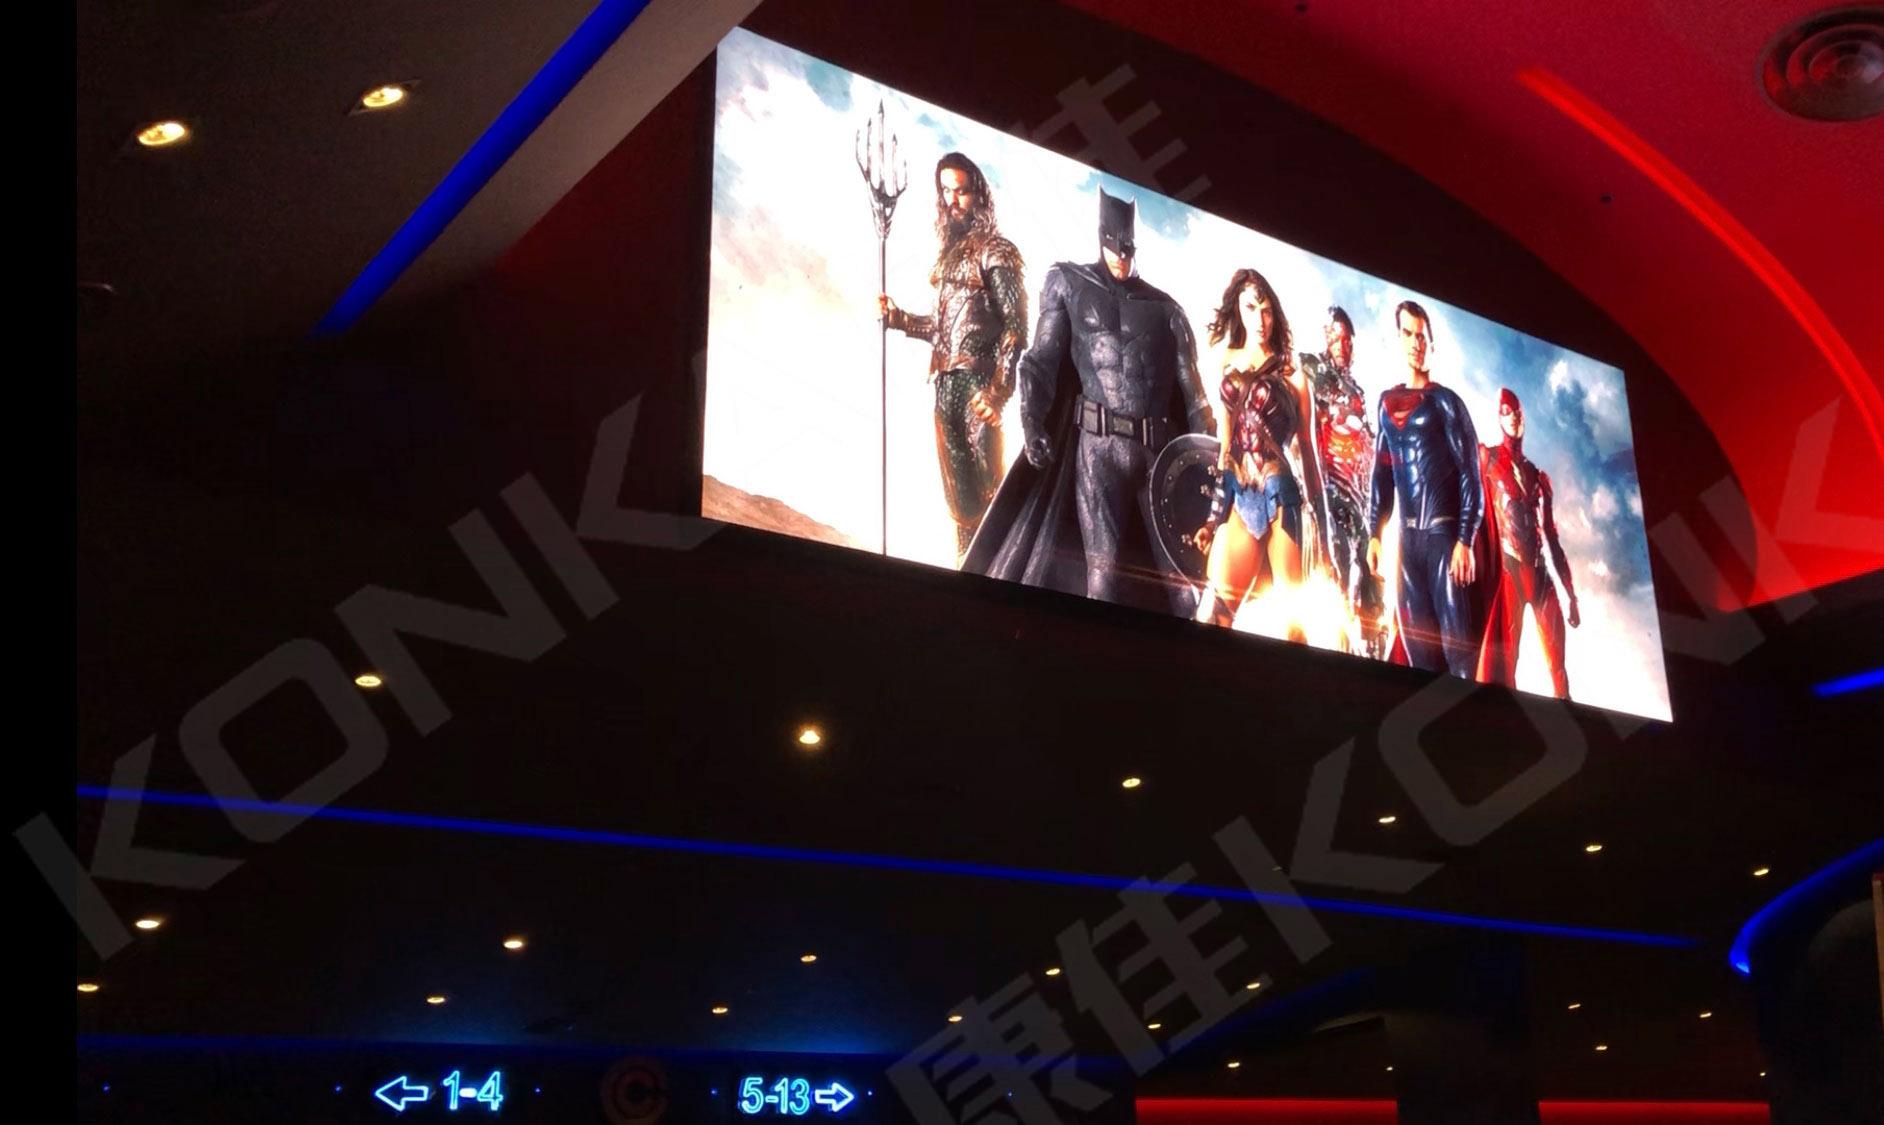 "<span style=""font-size:13.3333px;"">Poland Cinema P4 LED Display</span>"